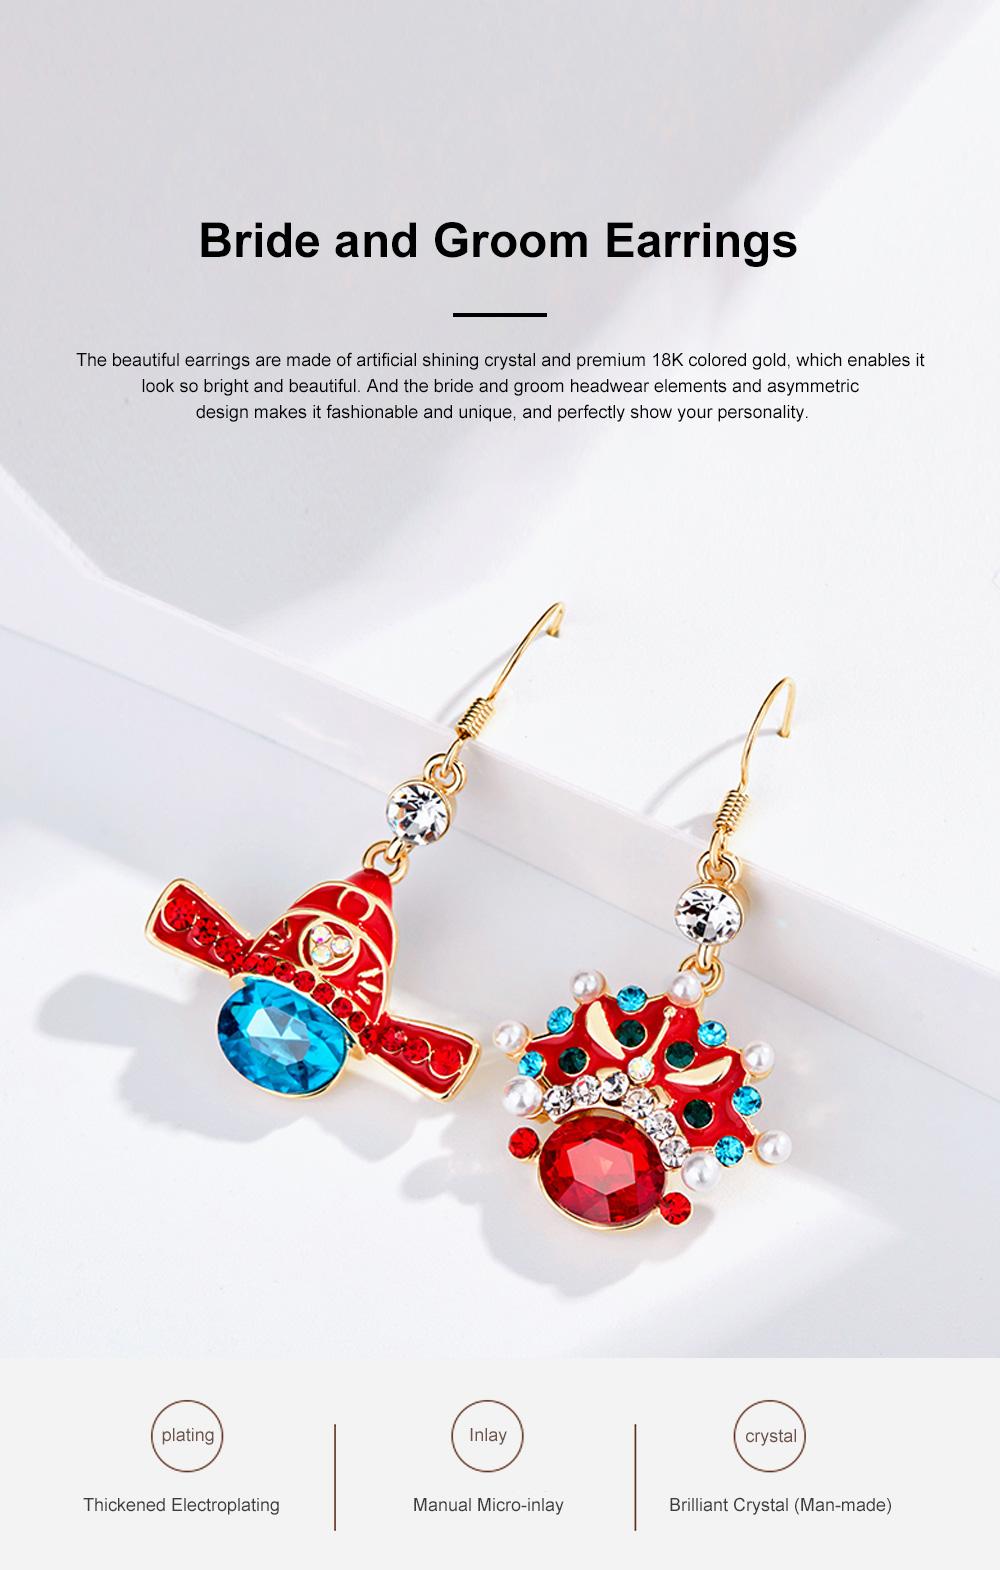 Chinese Style Dangle Earrings Asymmetric Personality Crystal Earrings Bride Groom Earrings Studs 0